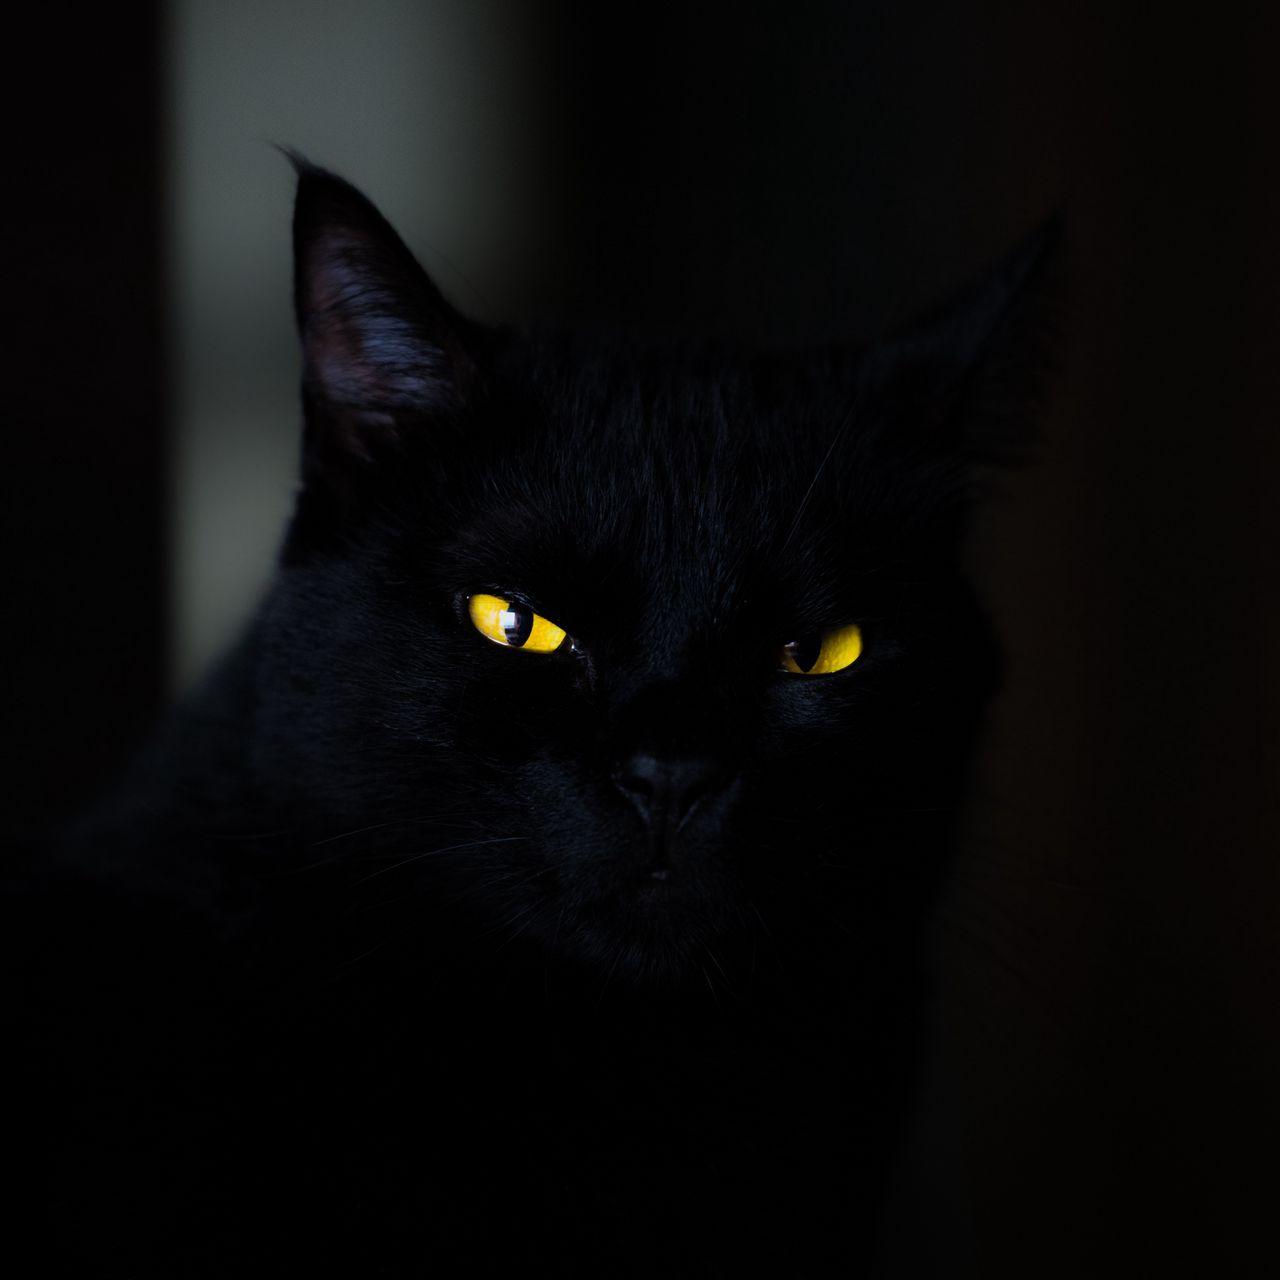 1280x1280 Wallpaper cat, eyes, black